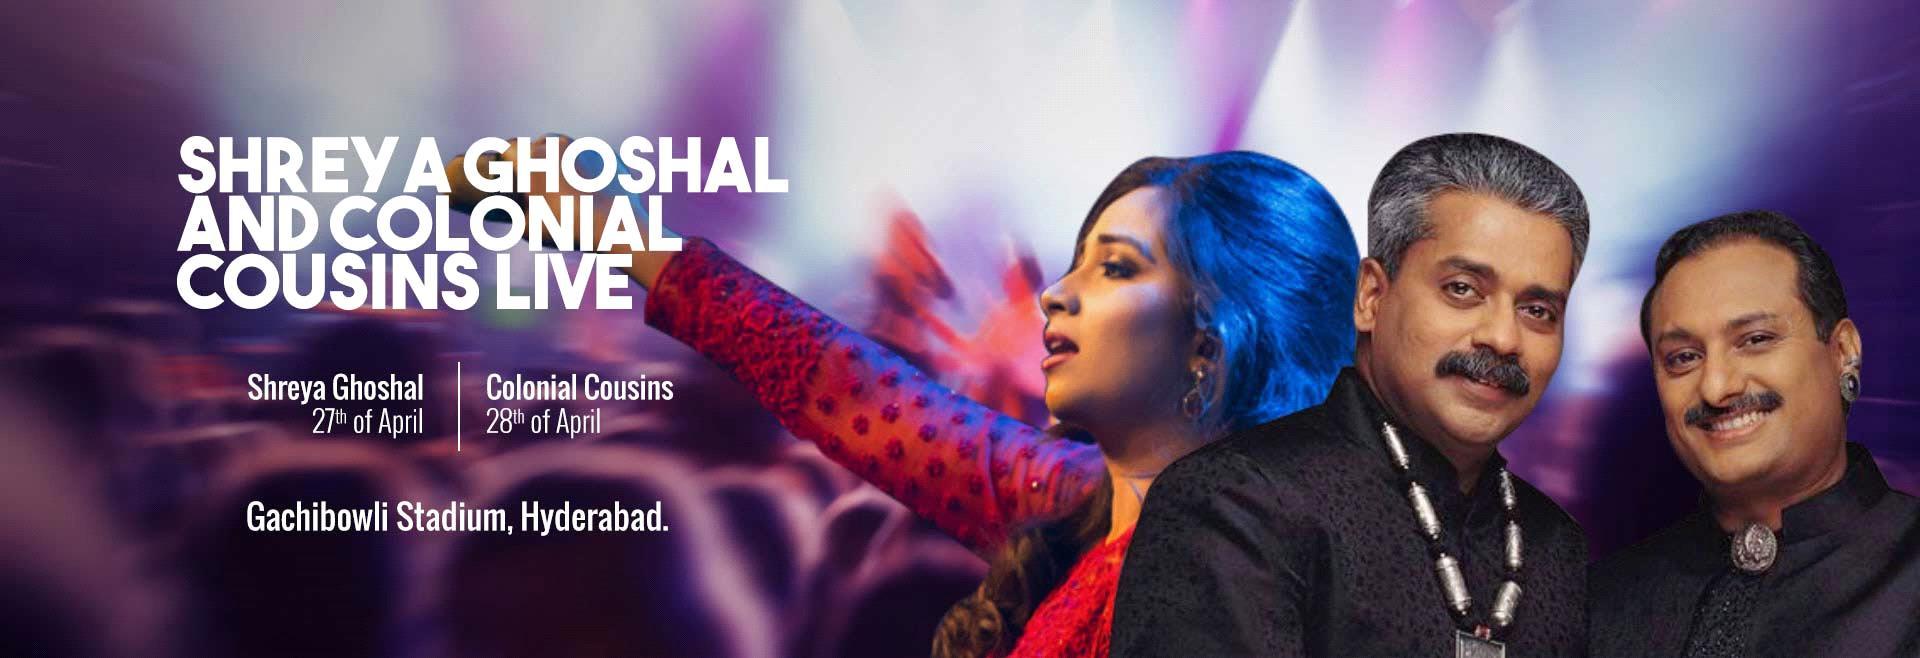 Shreya Ghoshal and Colonial Cousins Live